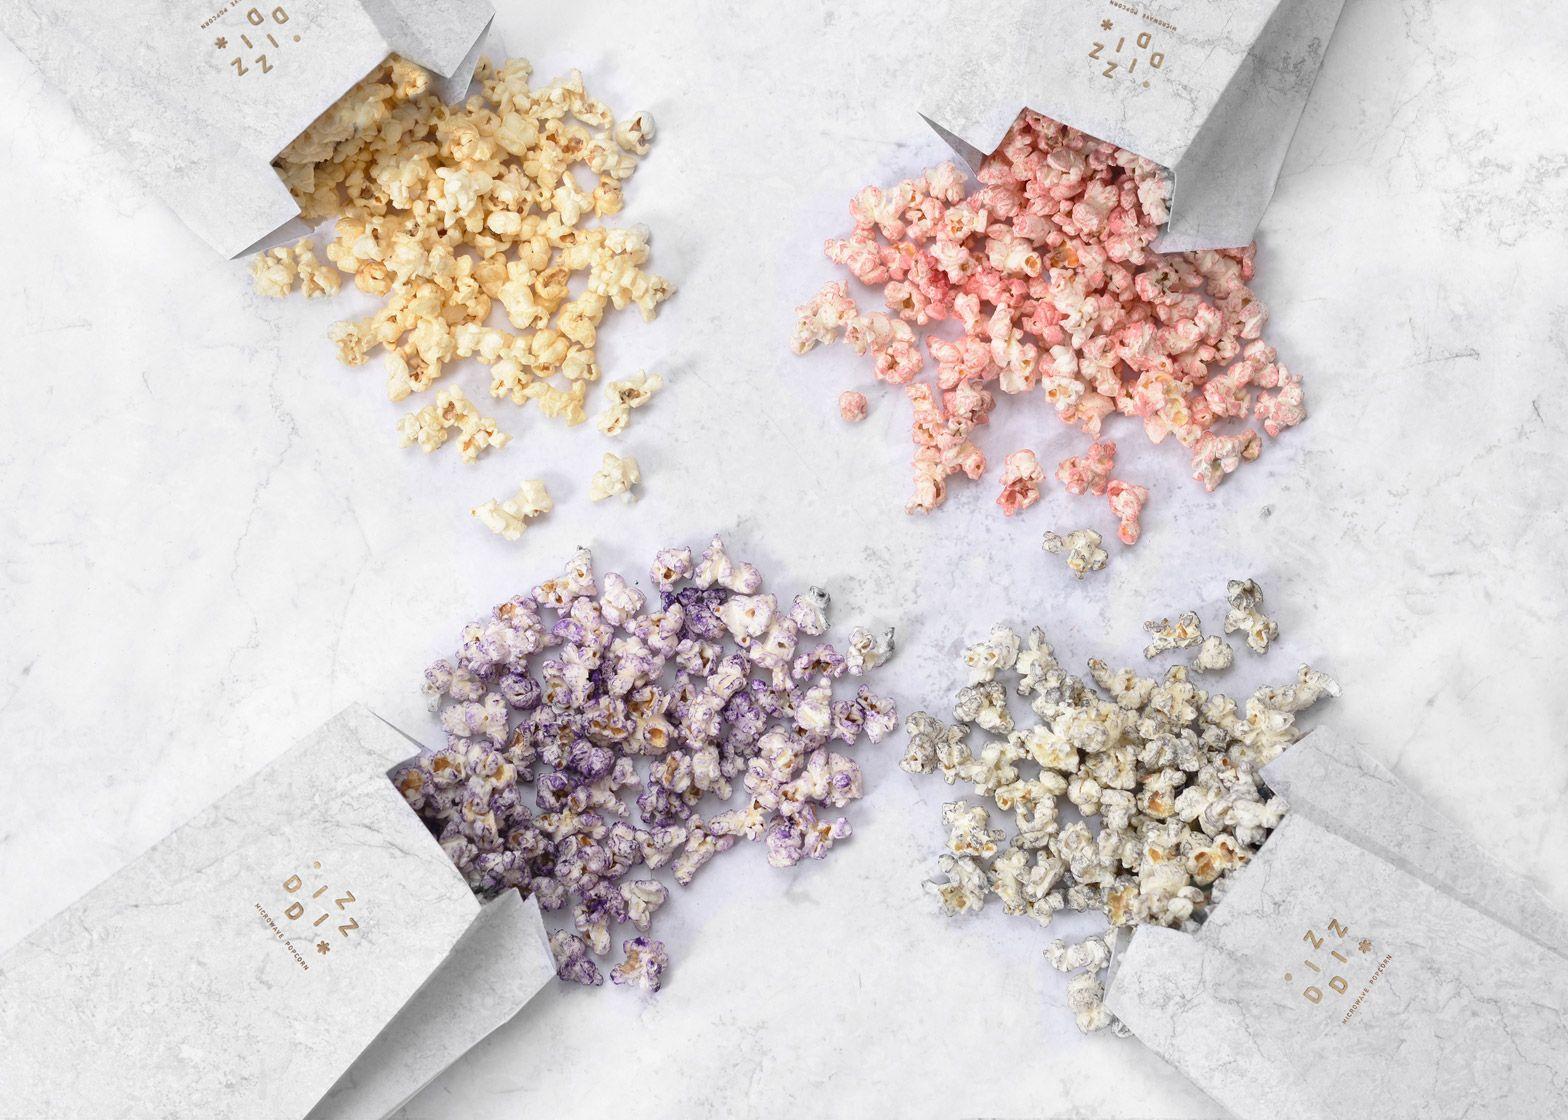 Tatabi Studio designs marbled packaging for gourmet popcorn